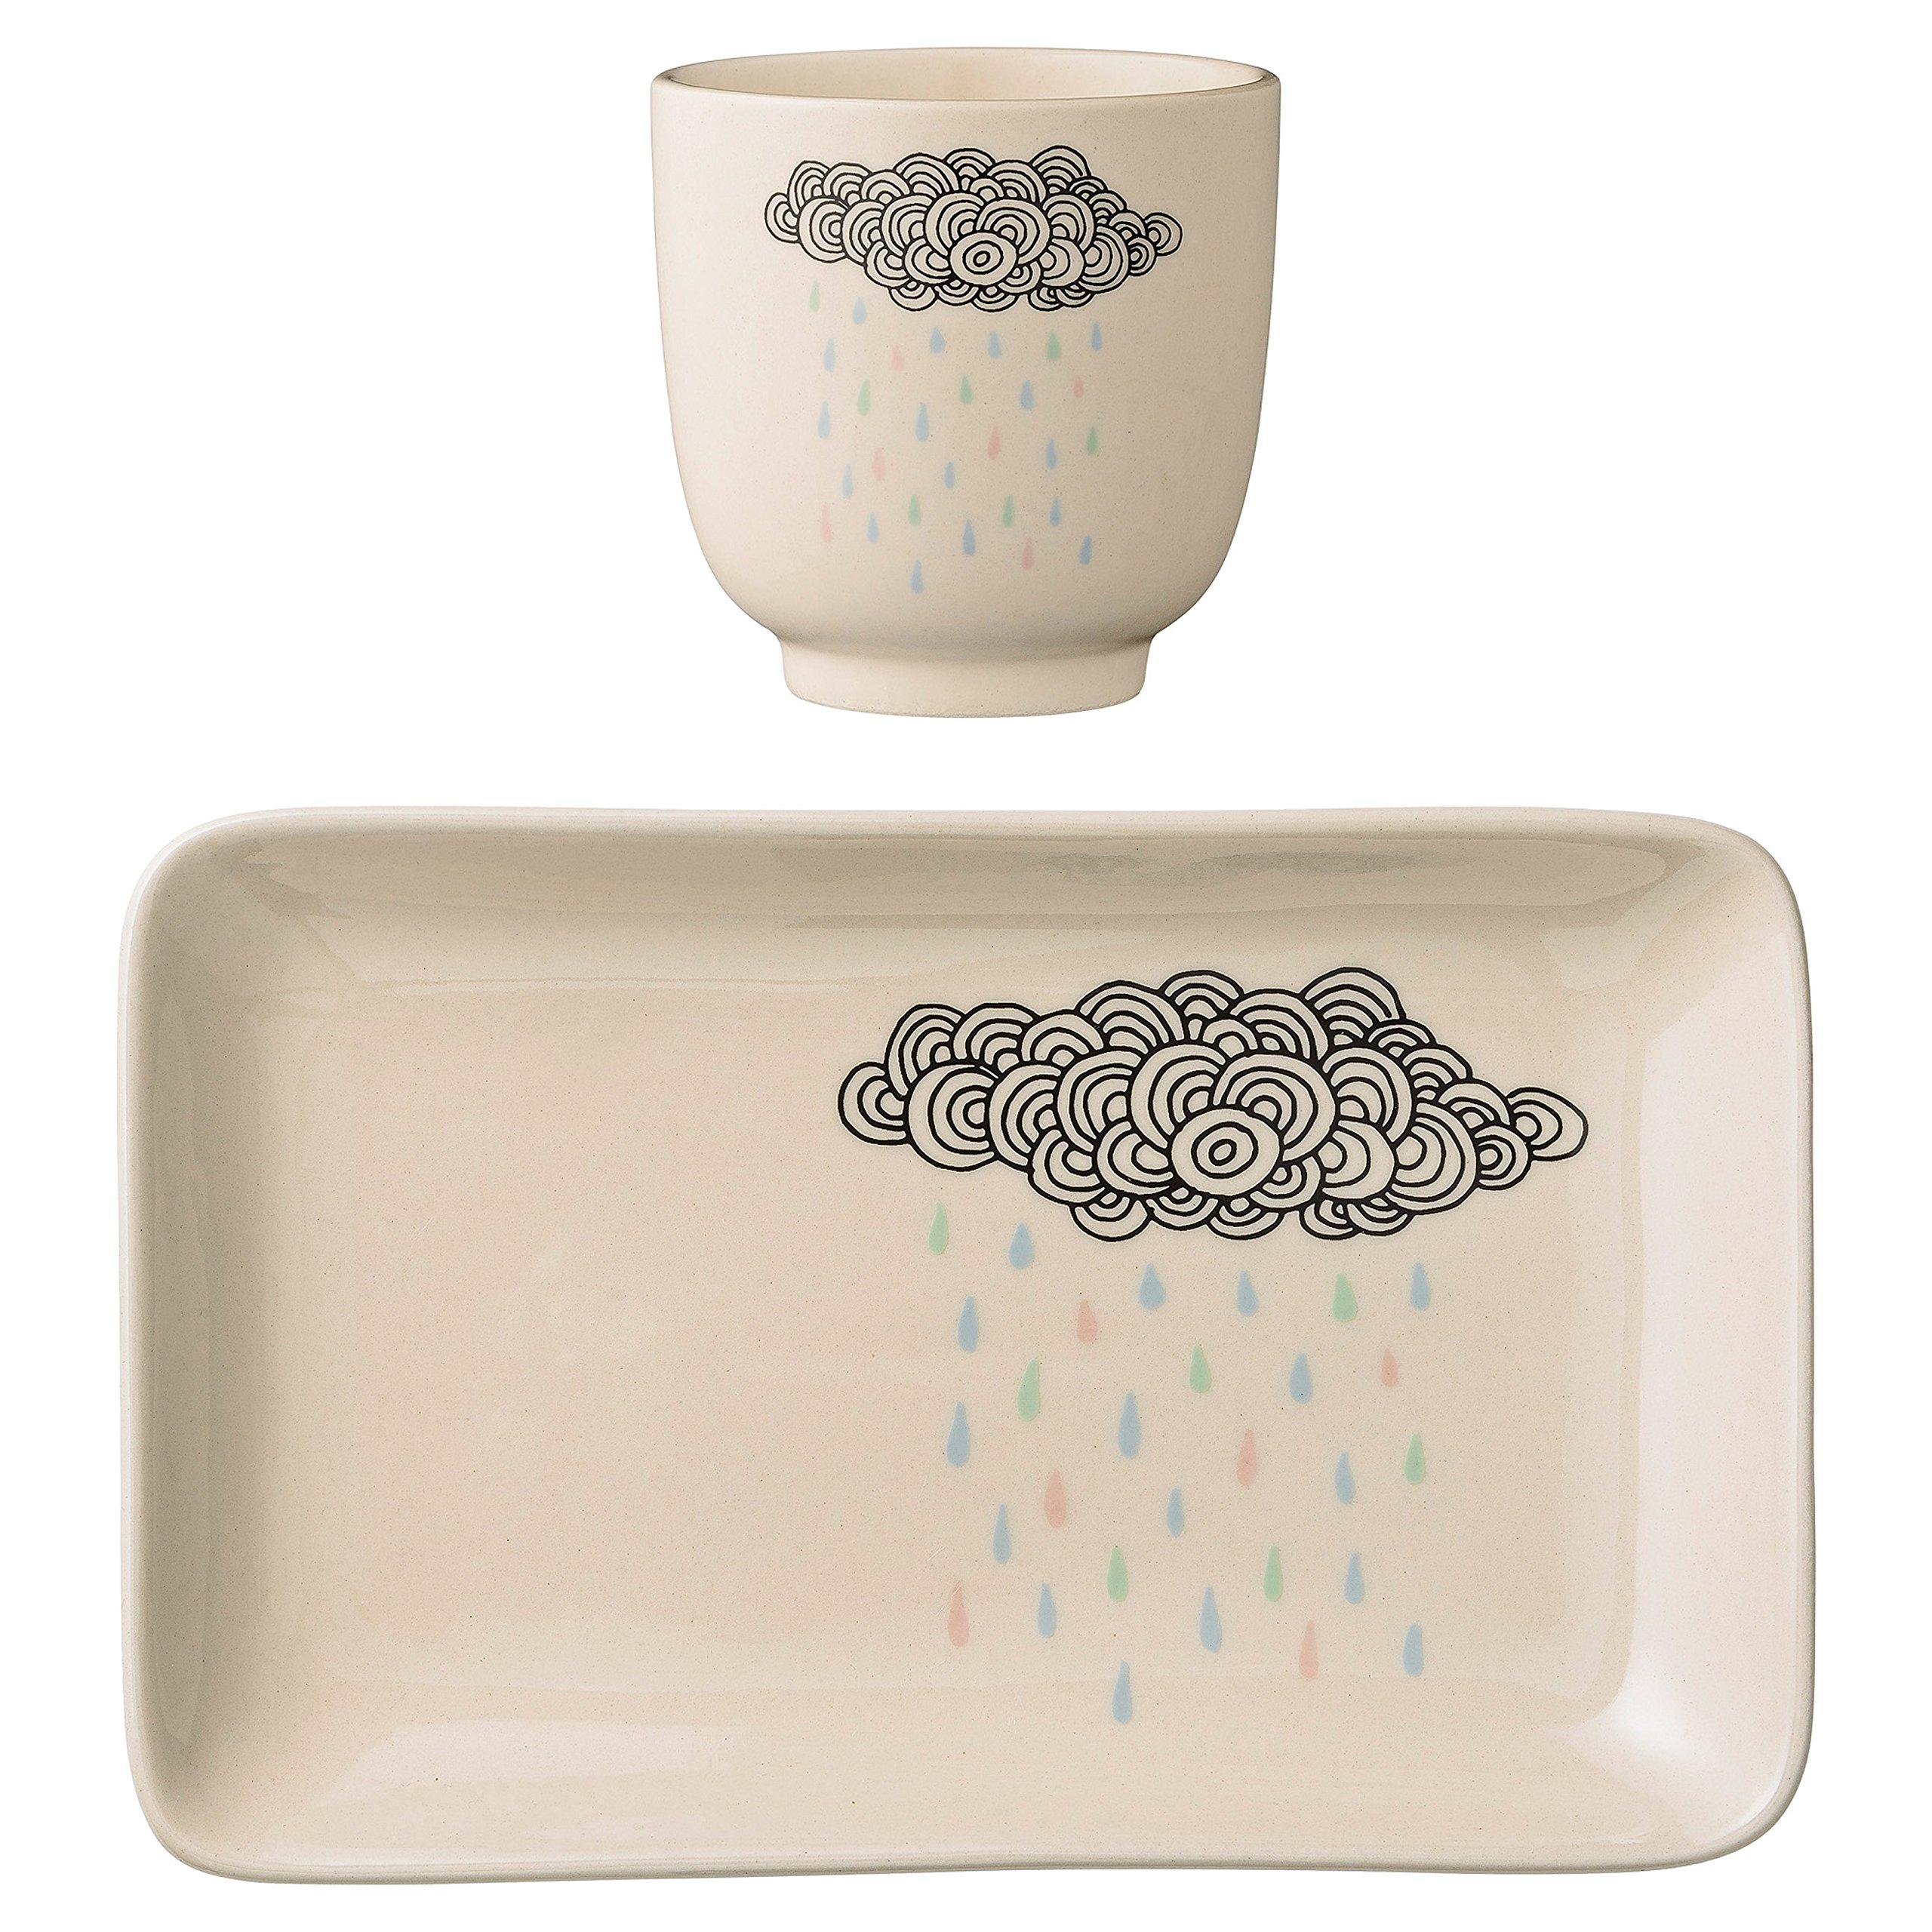 Bloomingville A21100638 Ceramic Rain Cloud Plate and Cup Set, Multicolor